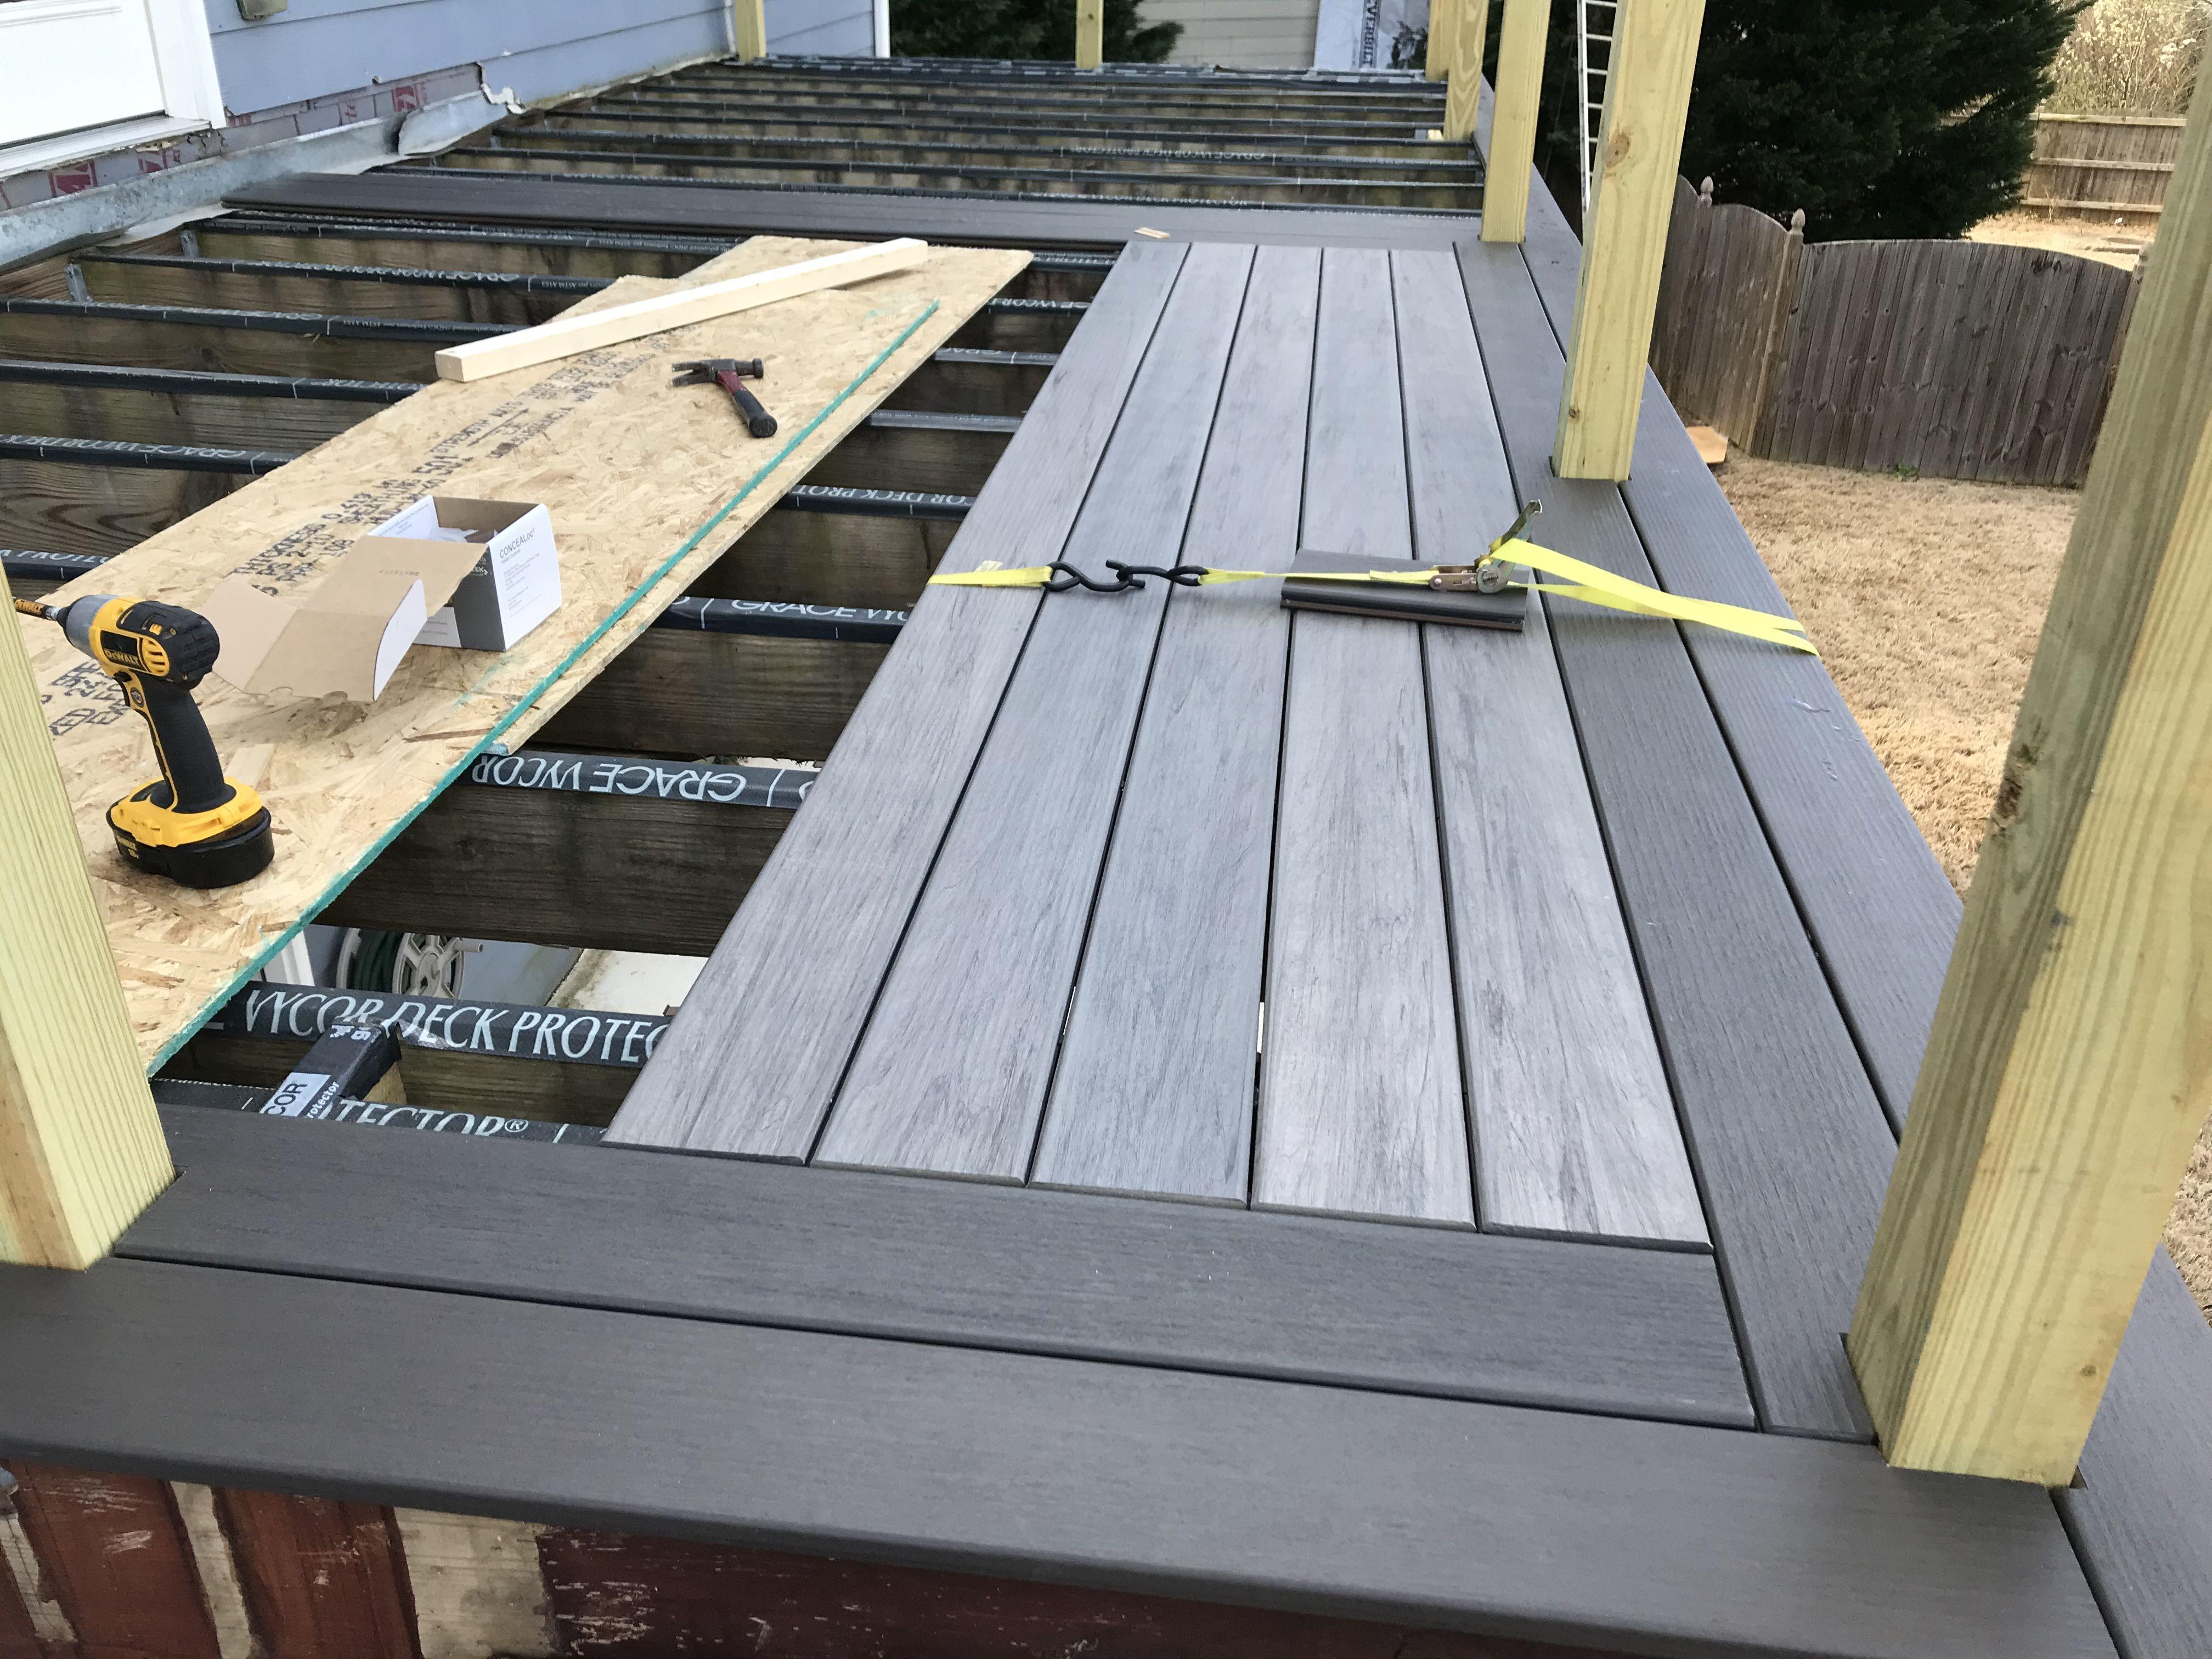 Installing Timbertech Legacy Composite Deck Boards In Espresso And Ash Deck Flooring Decks Backyard Deck Remodel